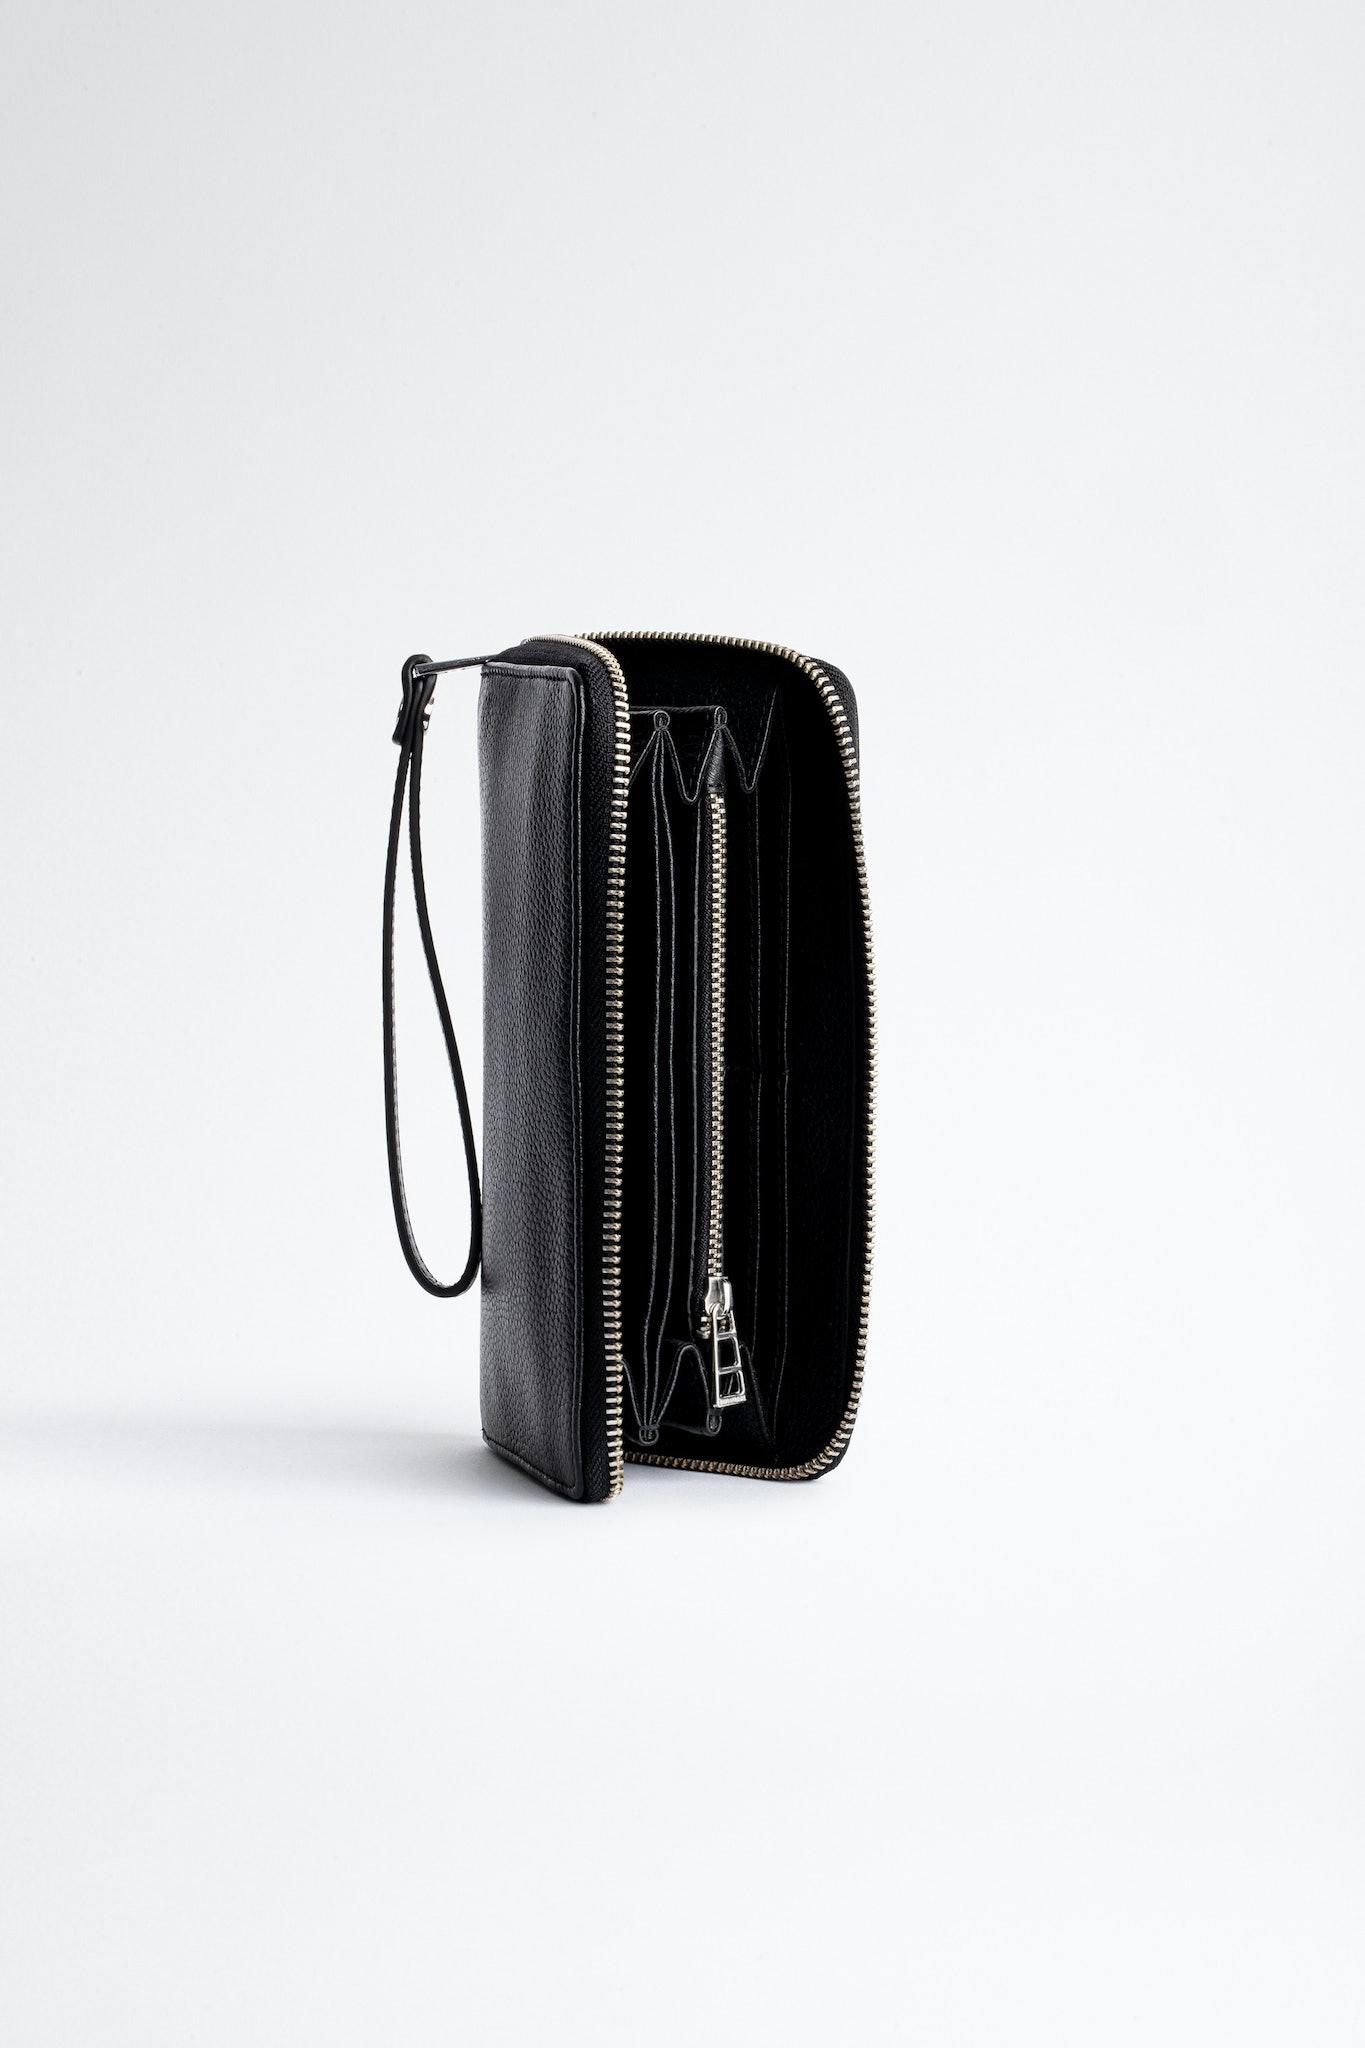 Compagnon Studs Outline Wallet